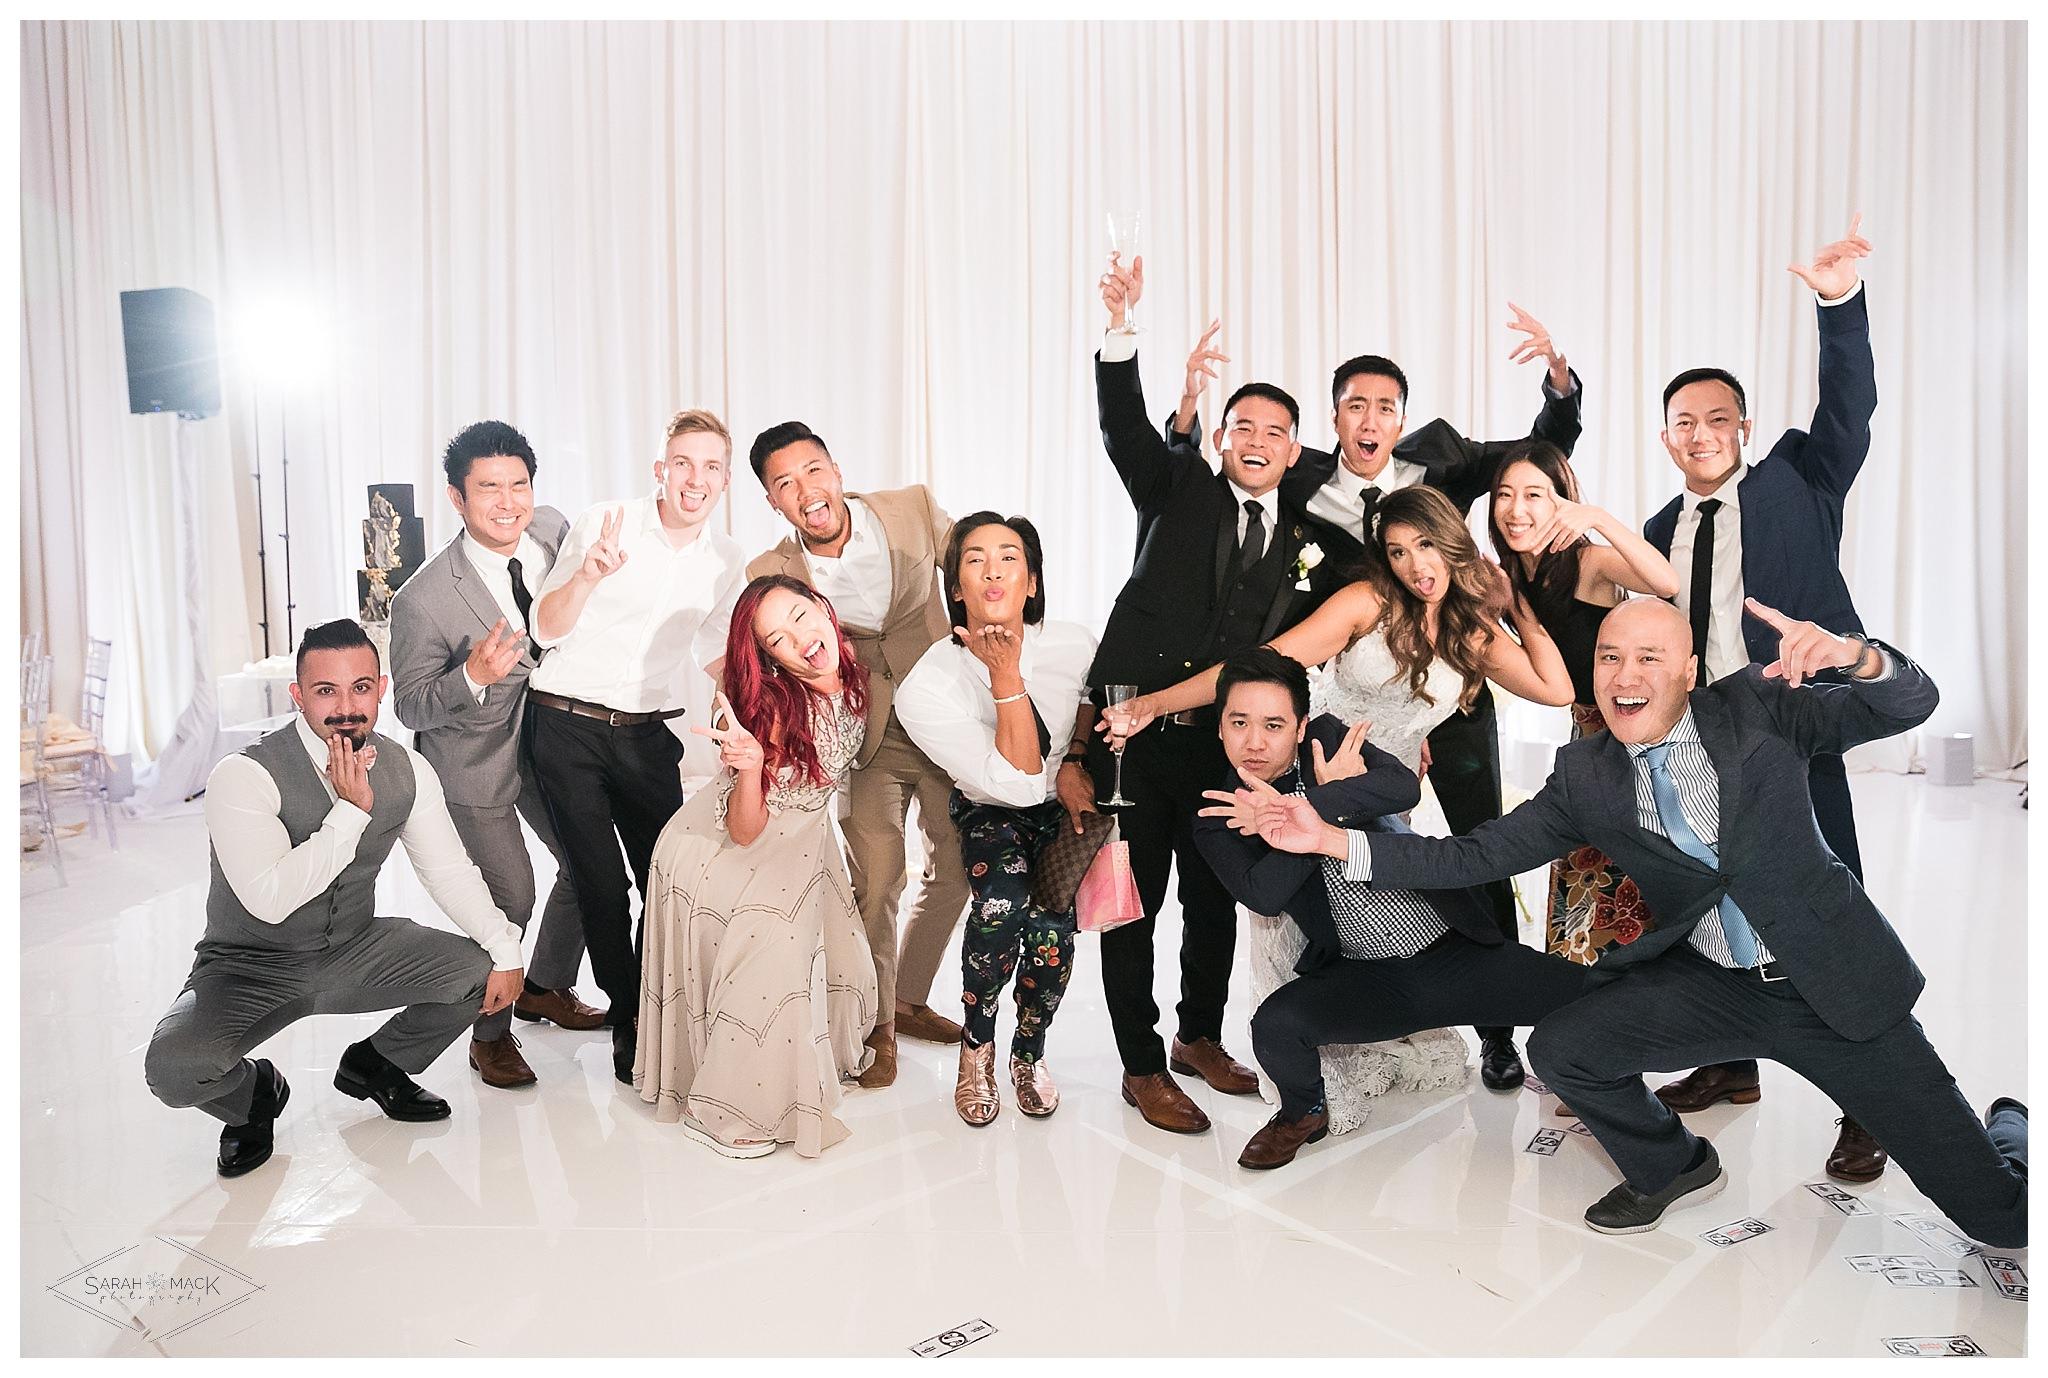 LE-Avenue-of-the-Arts-Costa-Mesa-Wedding-Photography-0202.jpg